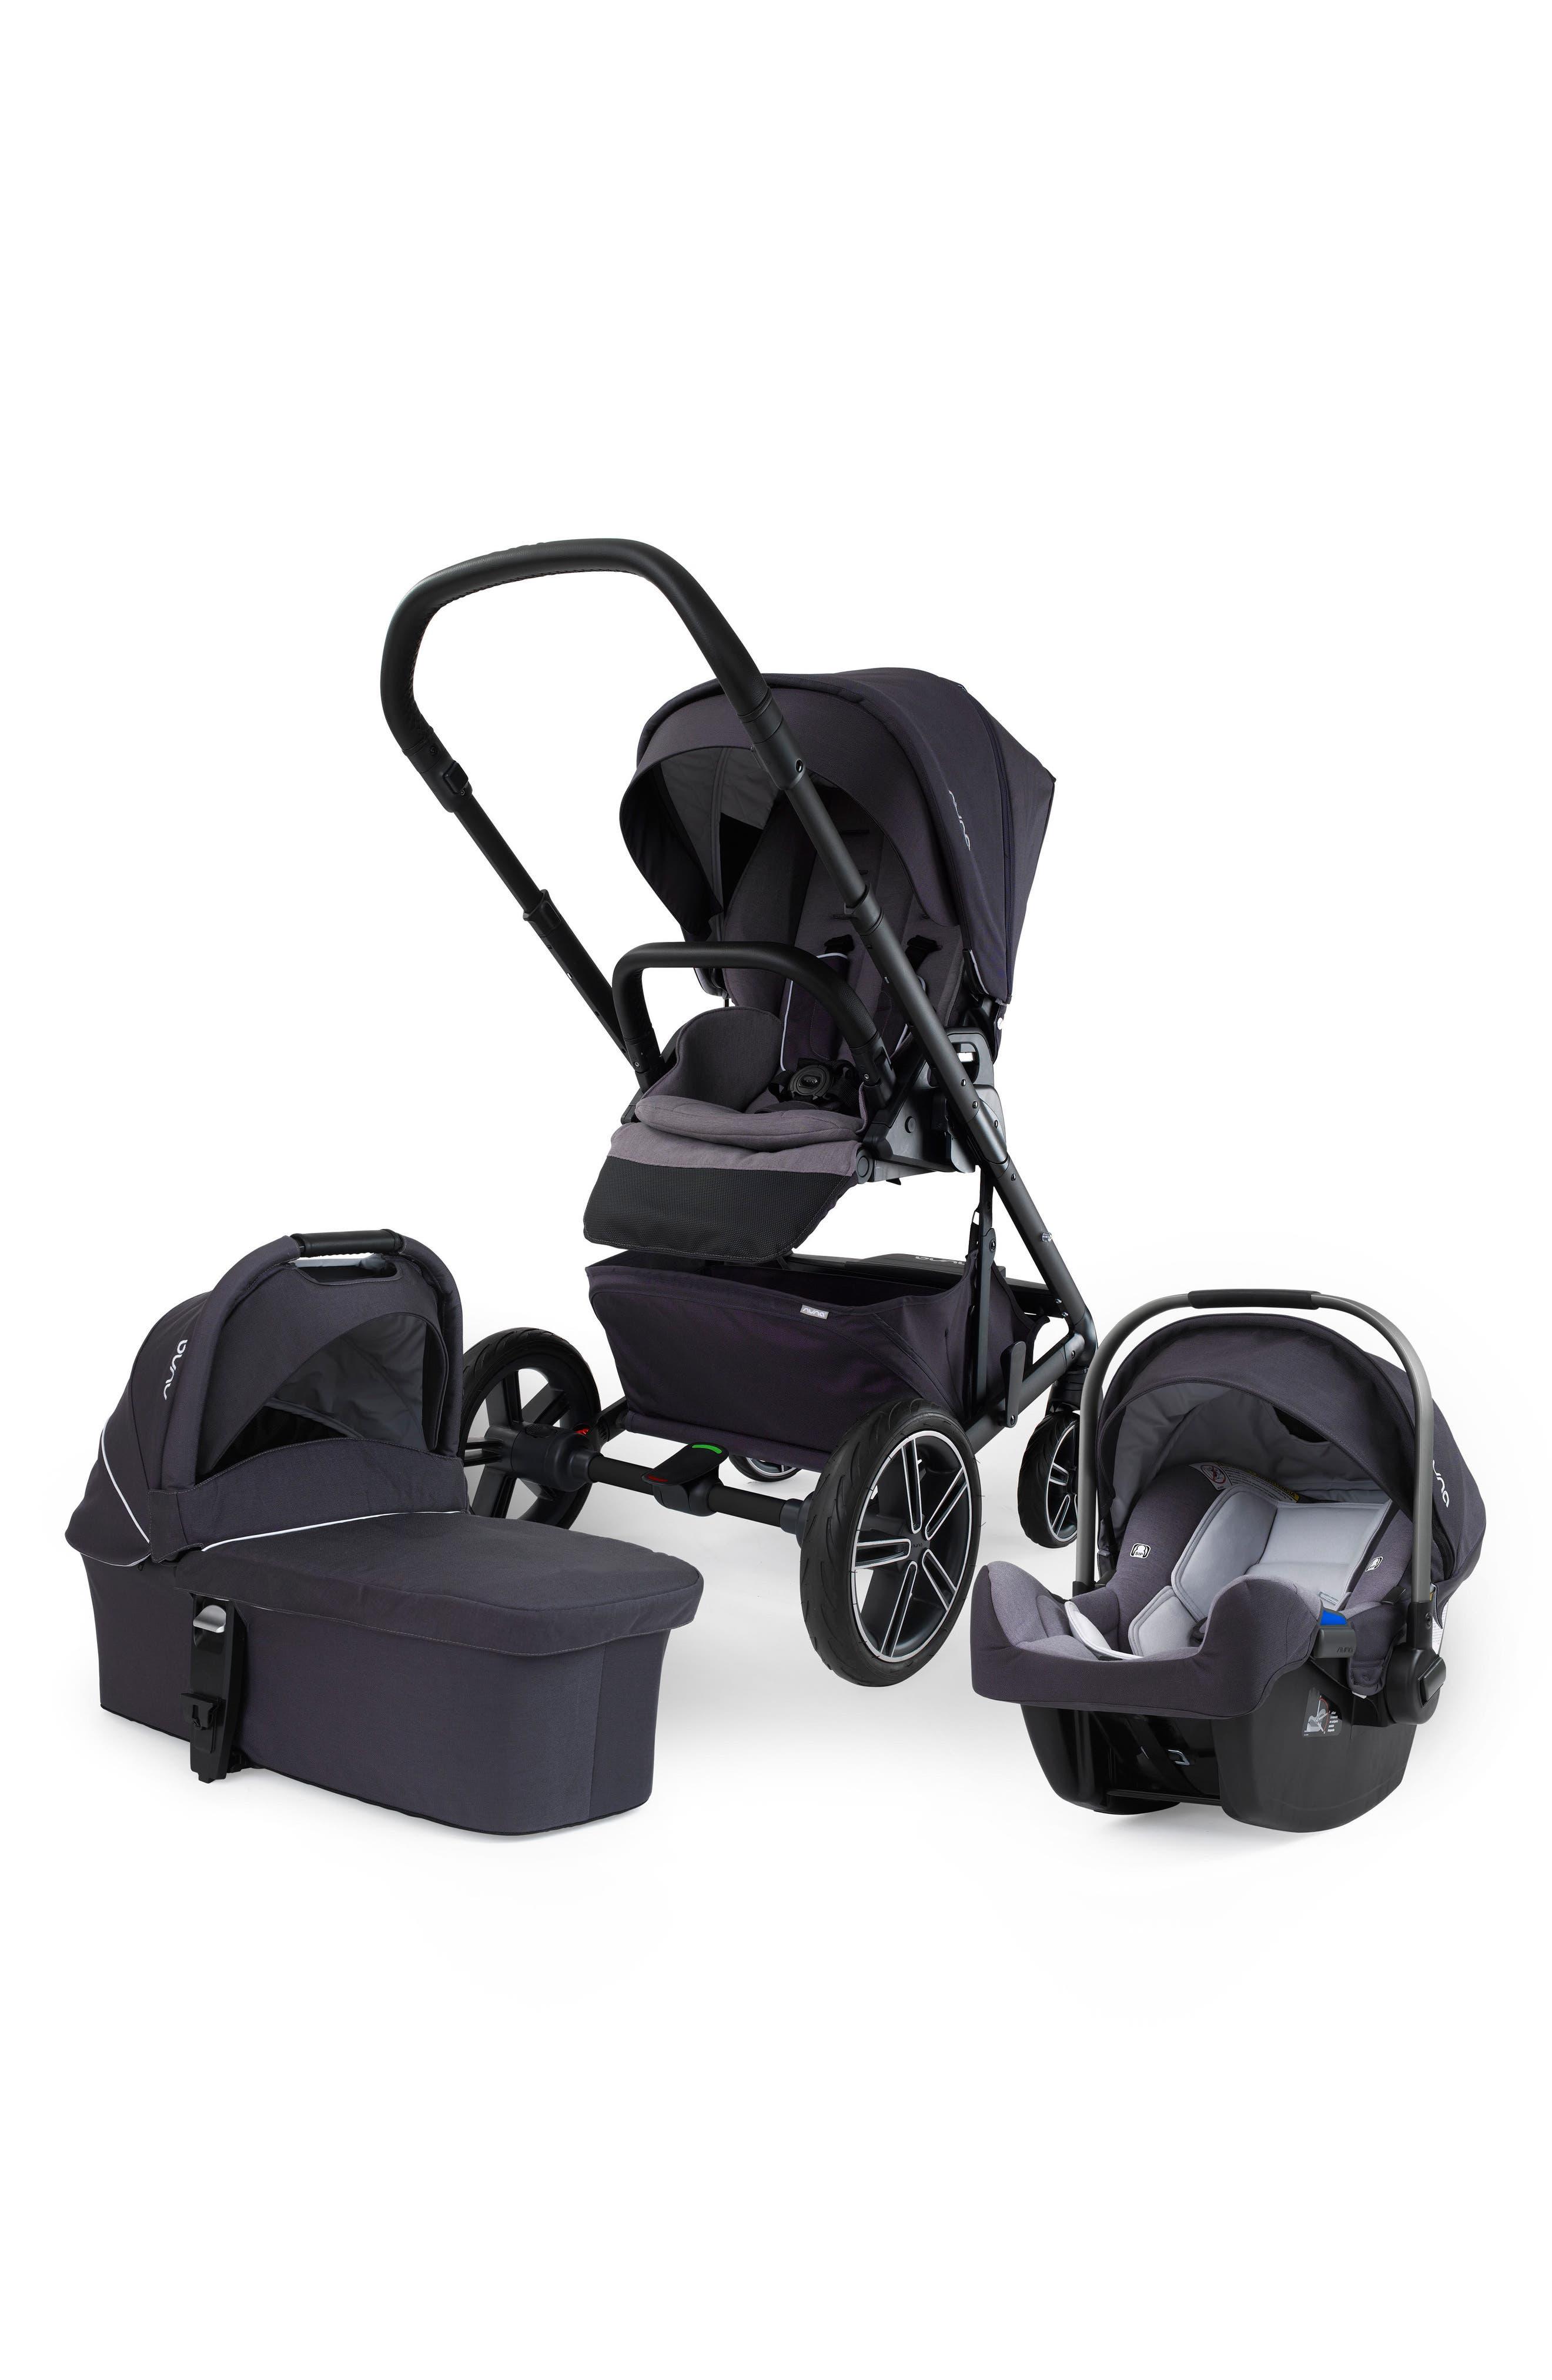 Main Image - nuna MIXX™ Stroller System & PIPA™ Car Seat Set